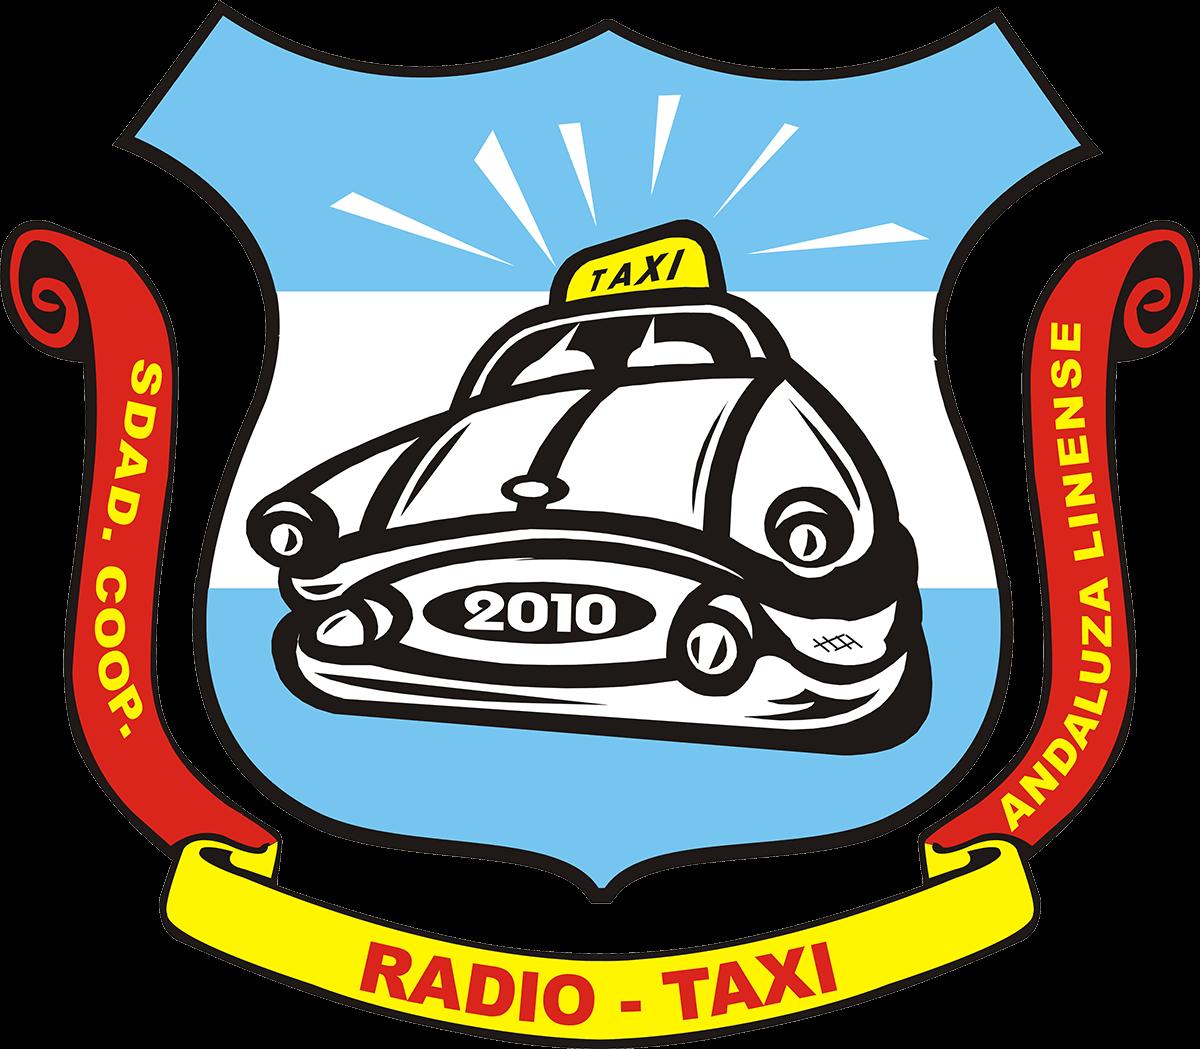 Taxi La Linea | Radio Taxi